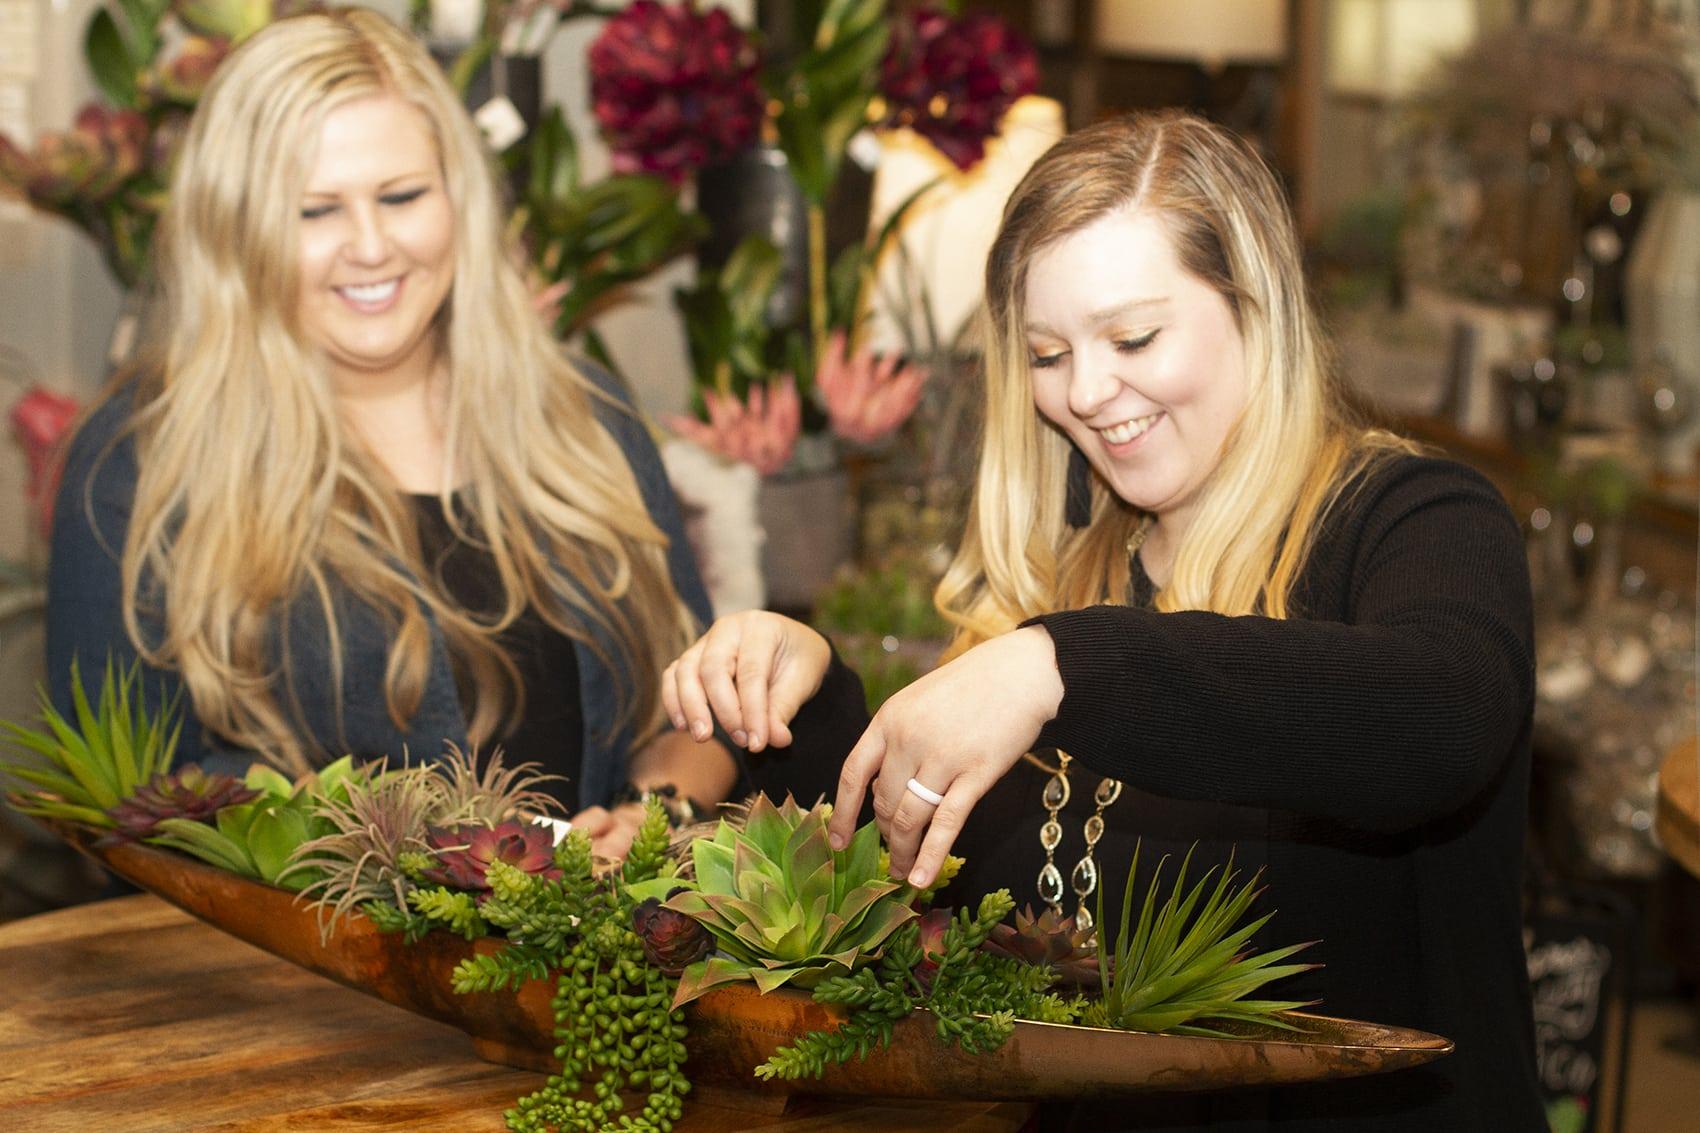 CeTerra Accents & Interiors Services - Custom Florals